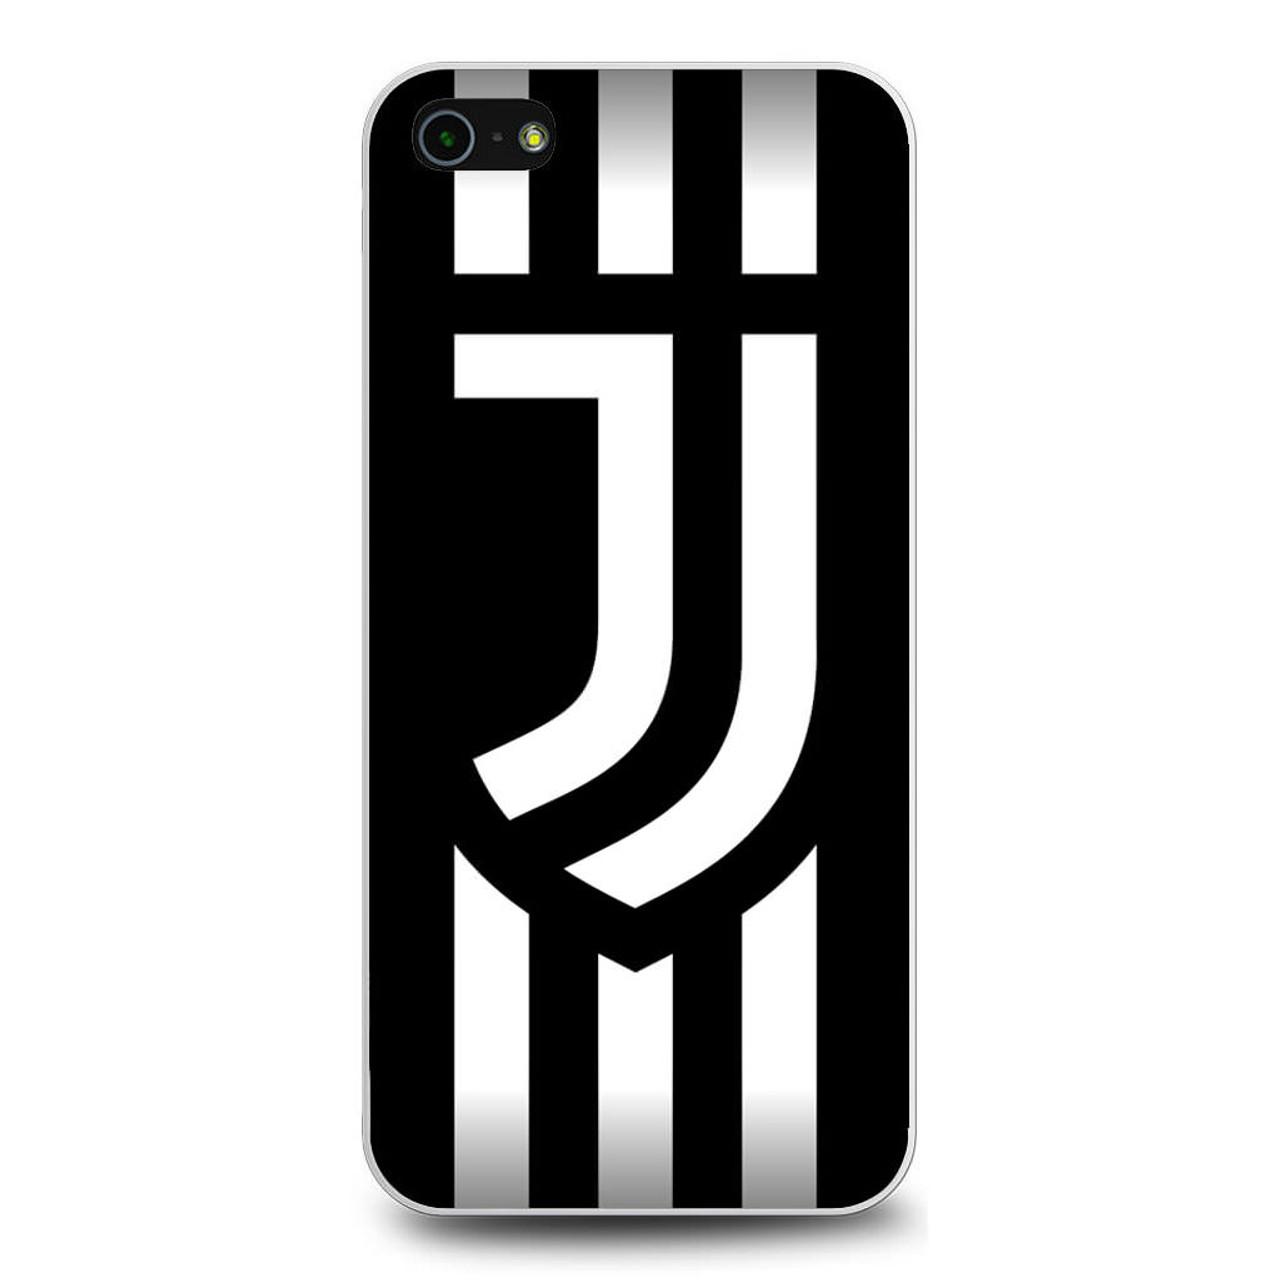 cover juventus iphone 5s